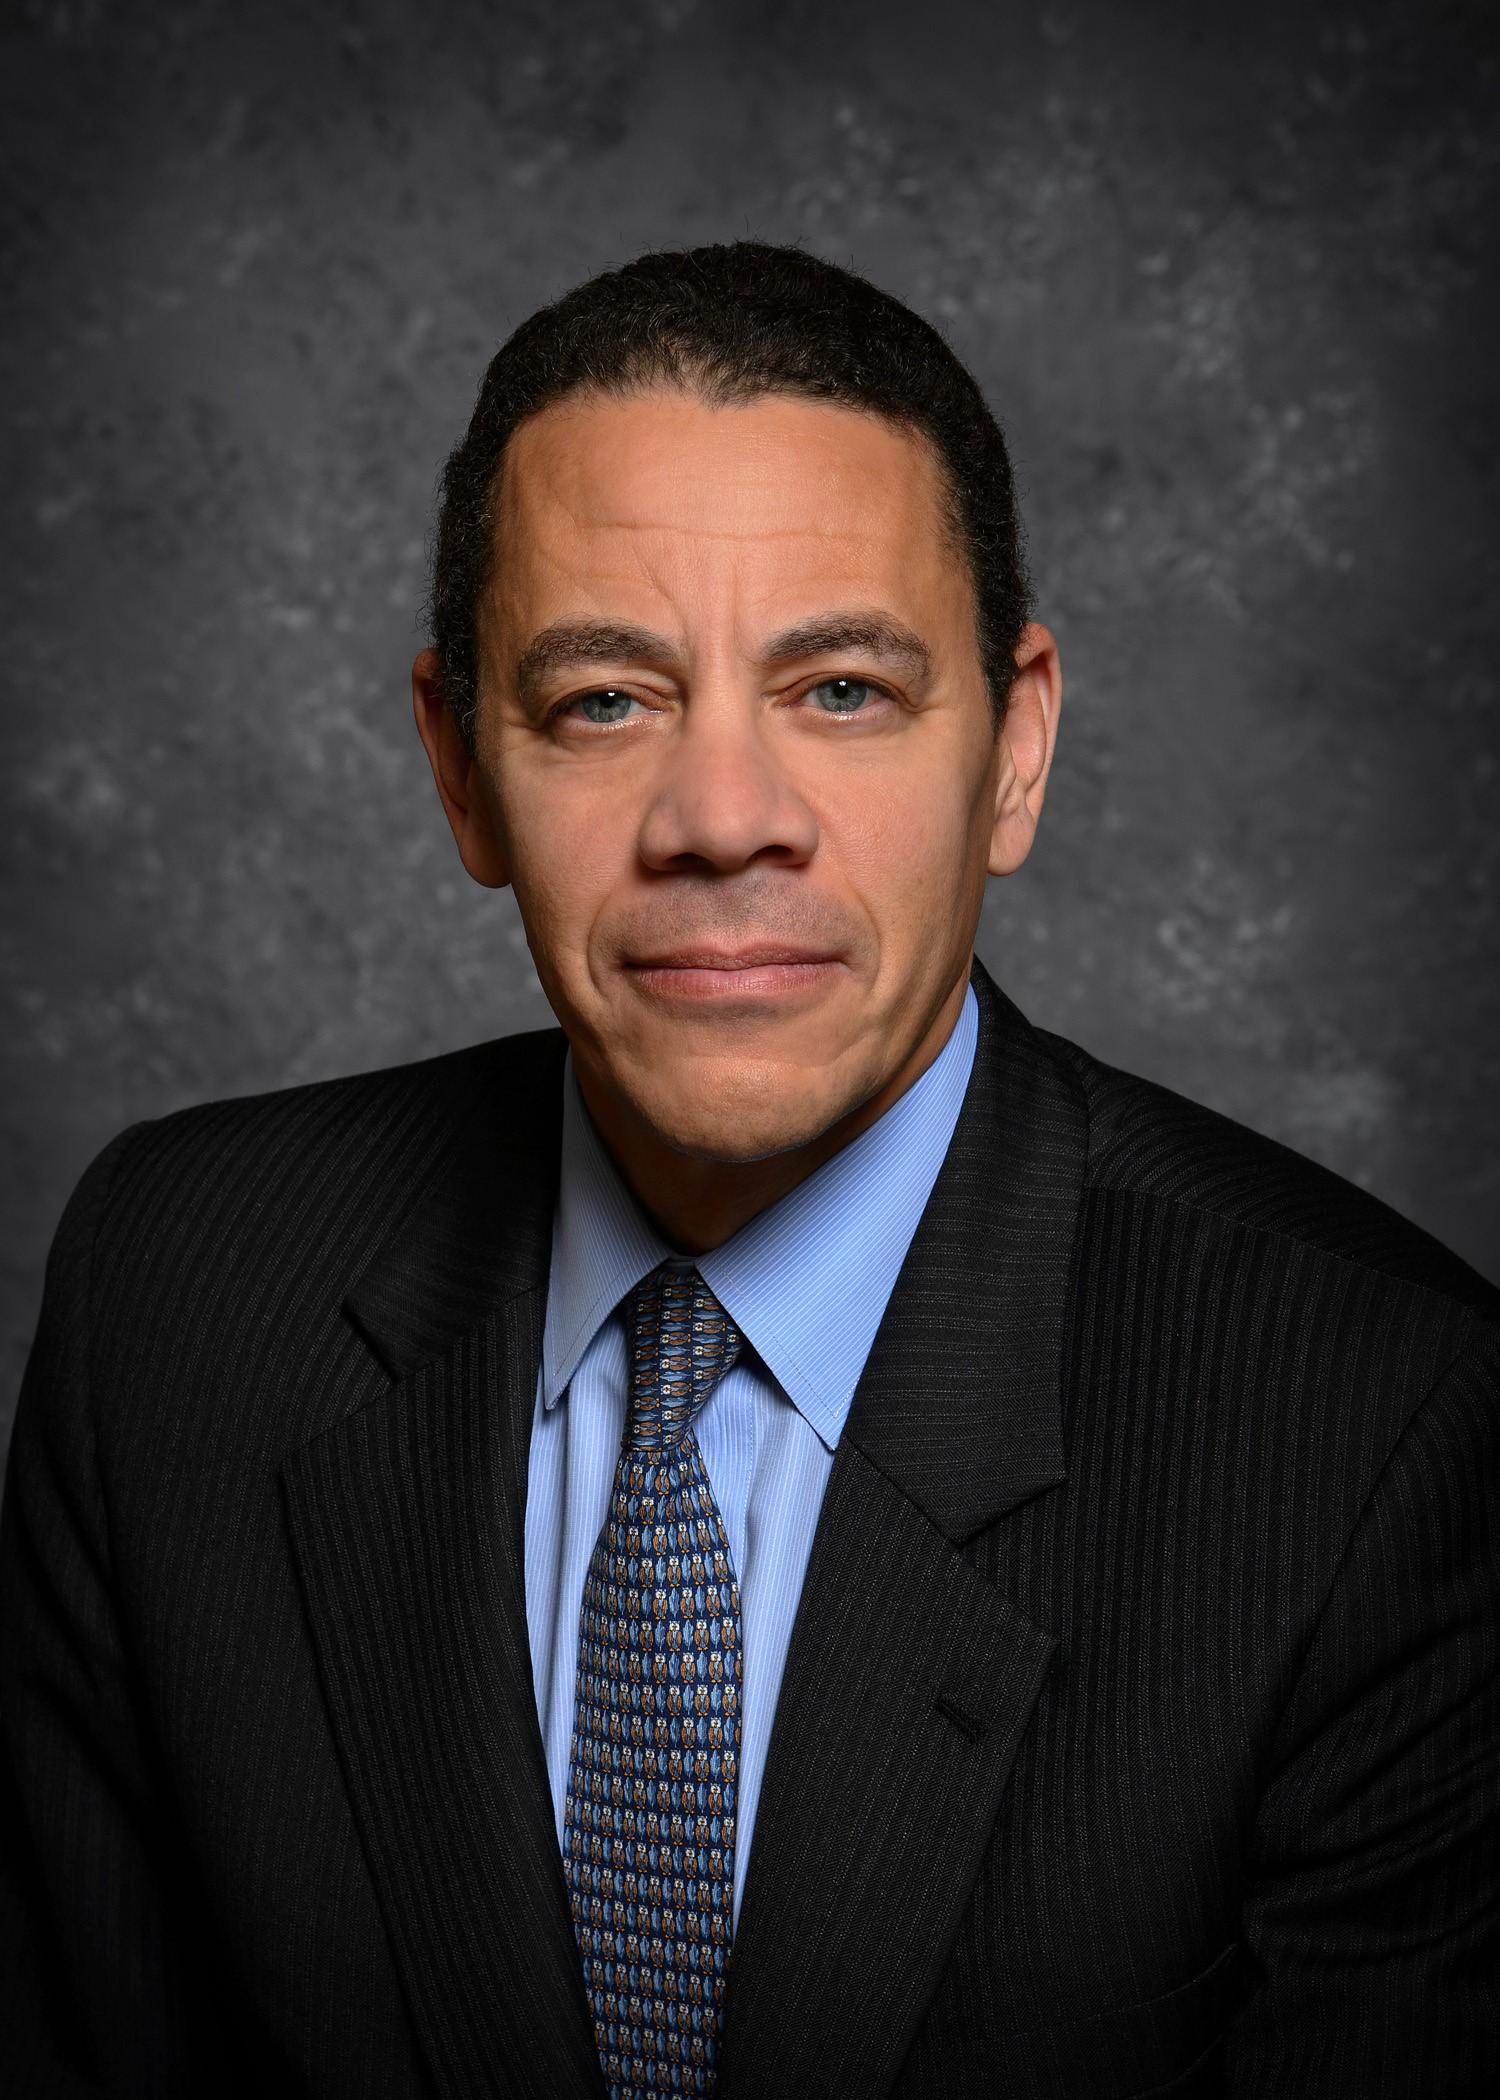 William Kennard, Member, Board of Directors, Ford Motor Company